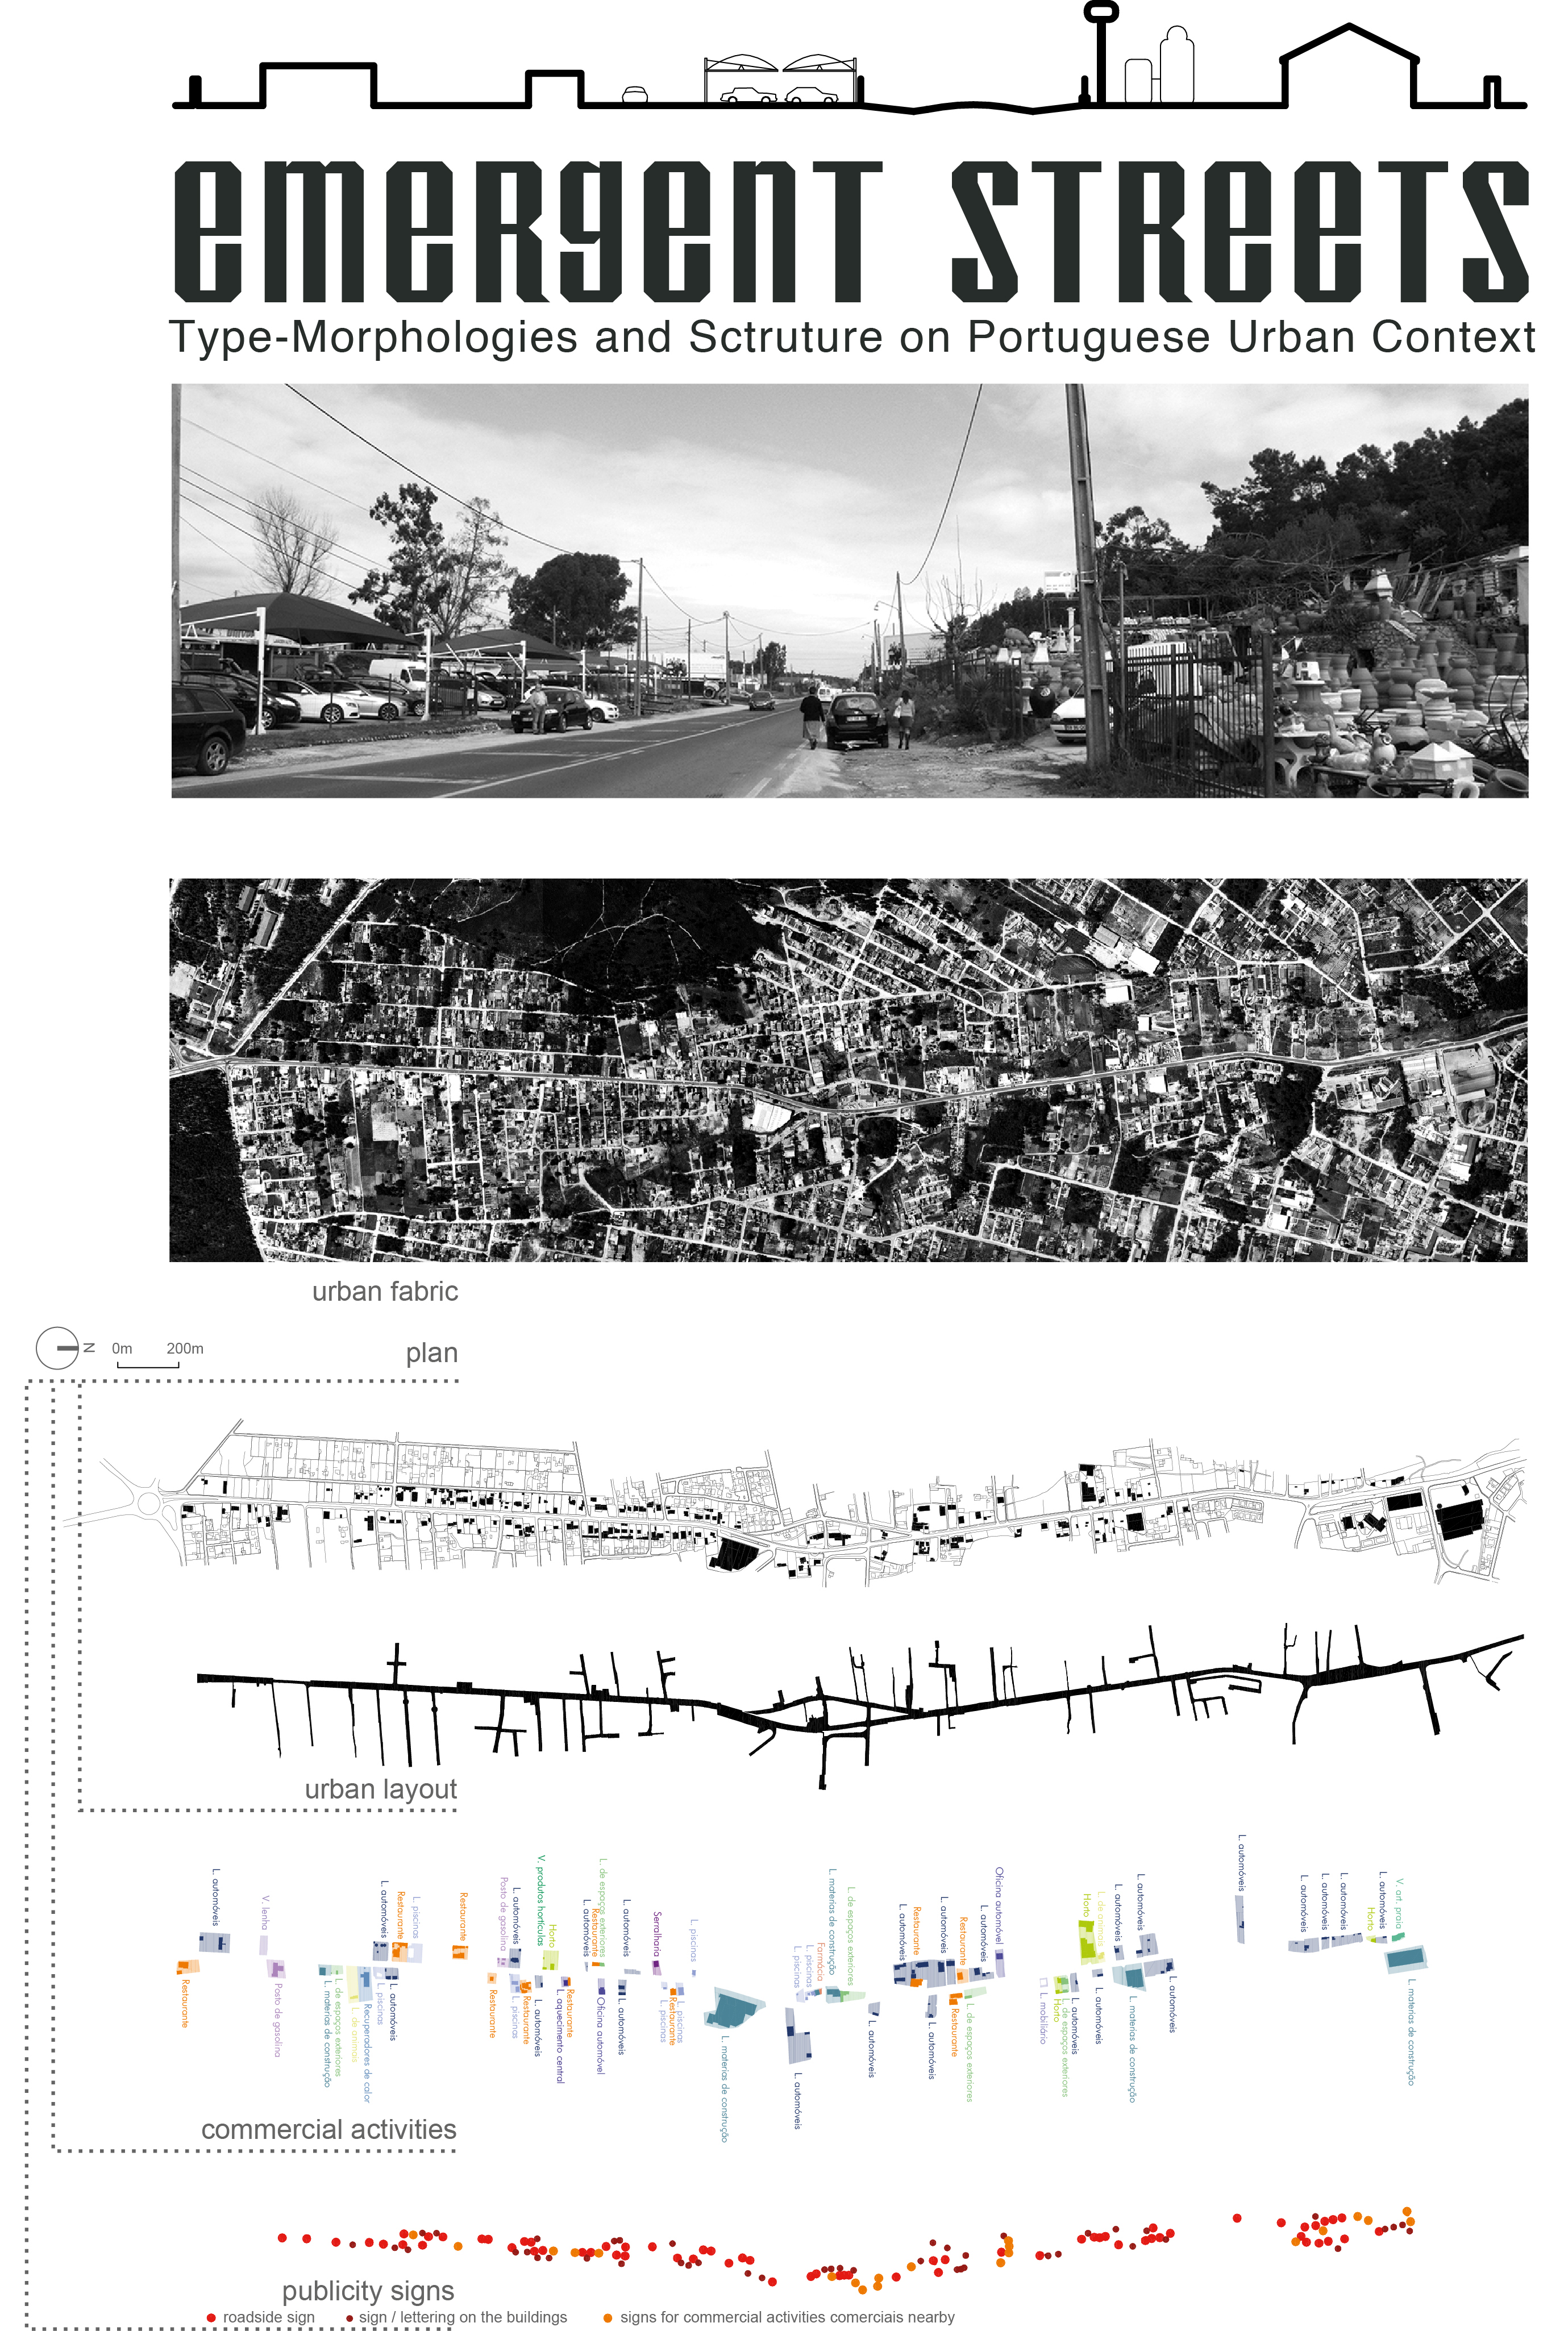 http://ud.t.u-tokyo.ac.jp/blog/_images/thesis%20image.jpg